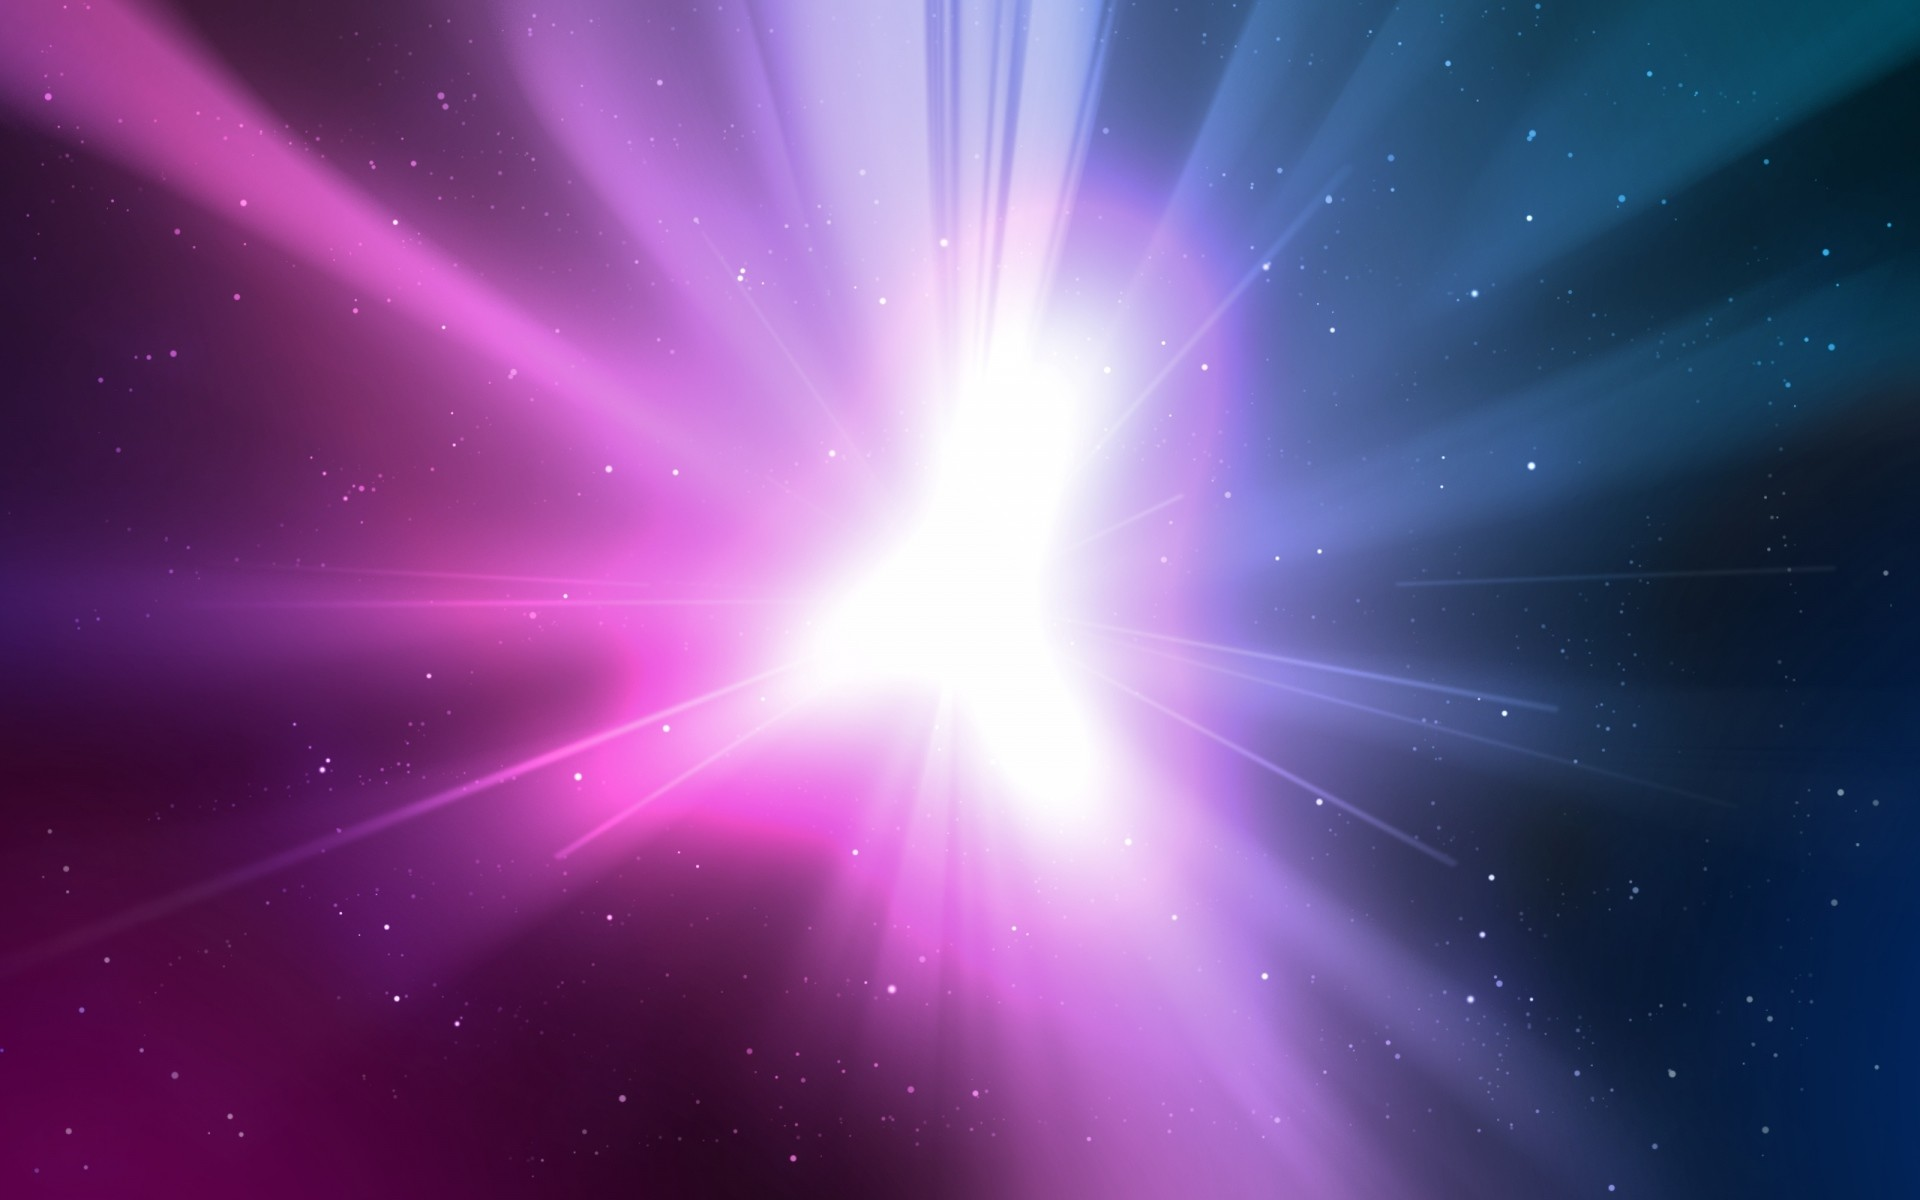 Wallpaper lights, light, purple, bright, shiny